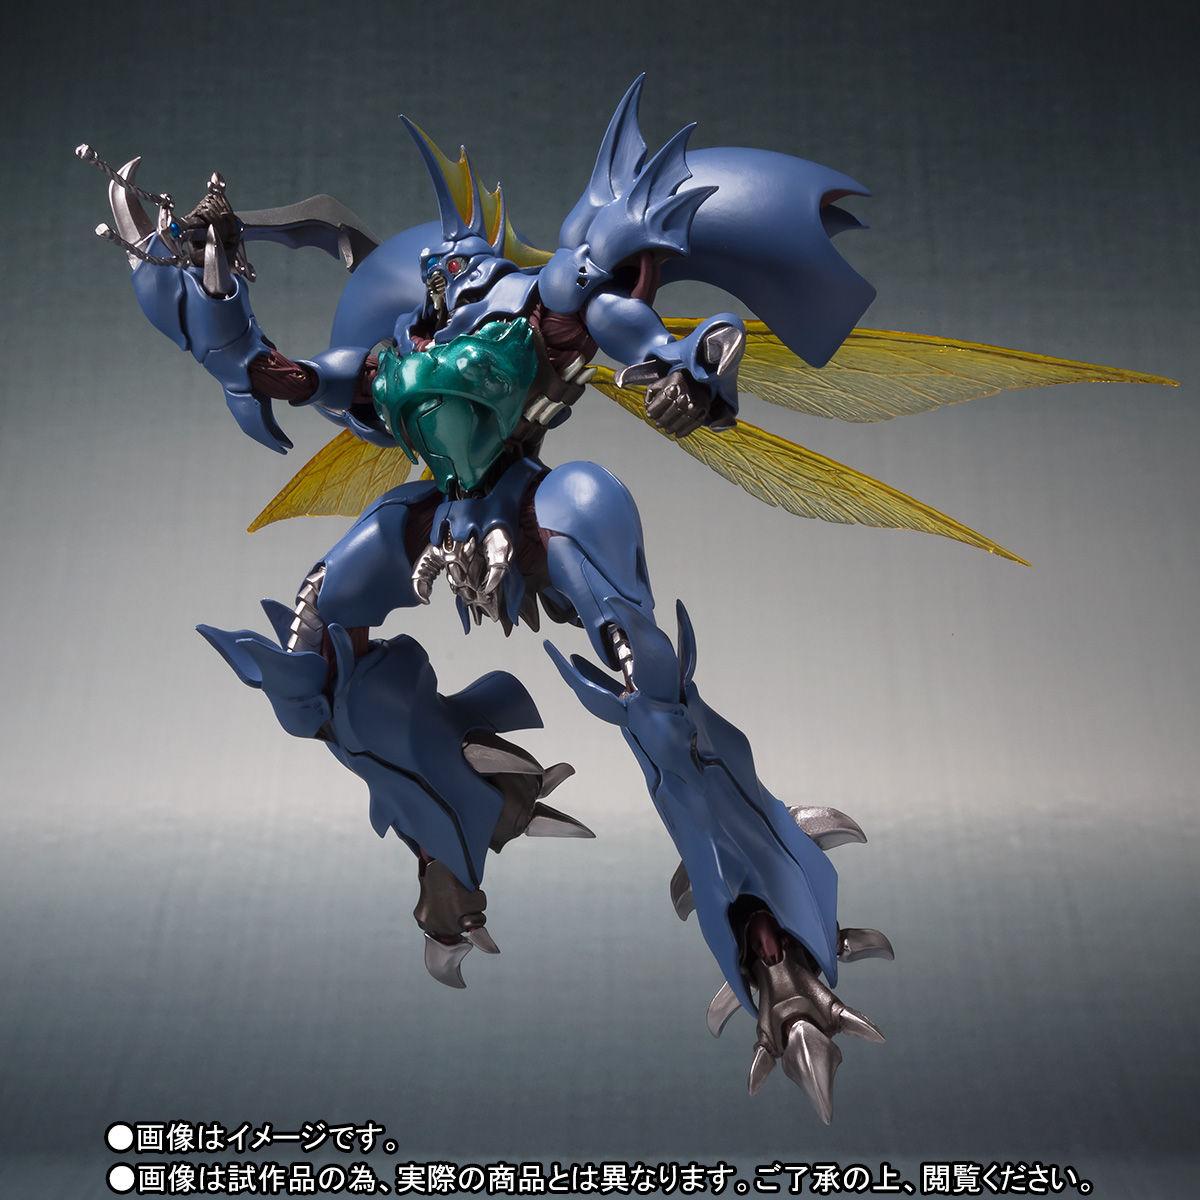 ROBOT魂〈SIDE AB〉『ギトール』聖戦士ダンバイン 可動フィギュア 可動フィギュア-009